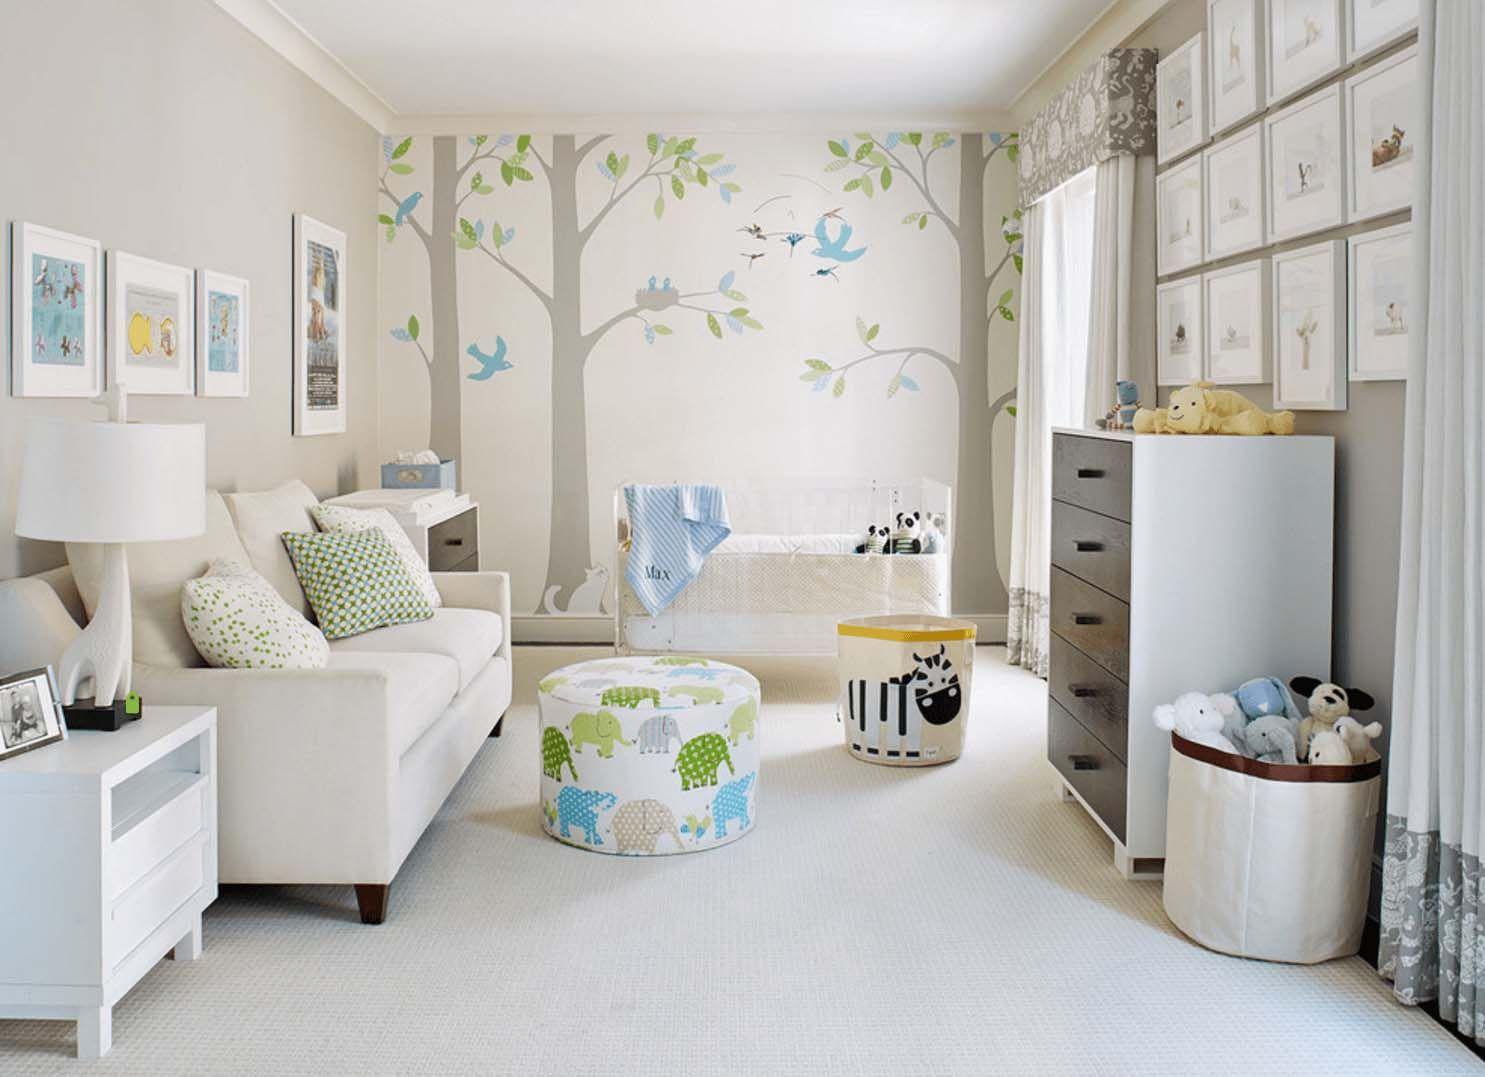 Flex Room Ideas Nursery Baby Room Decor Remodel Bedroom Bedroom Design